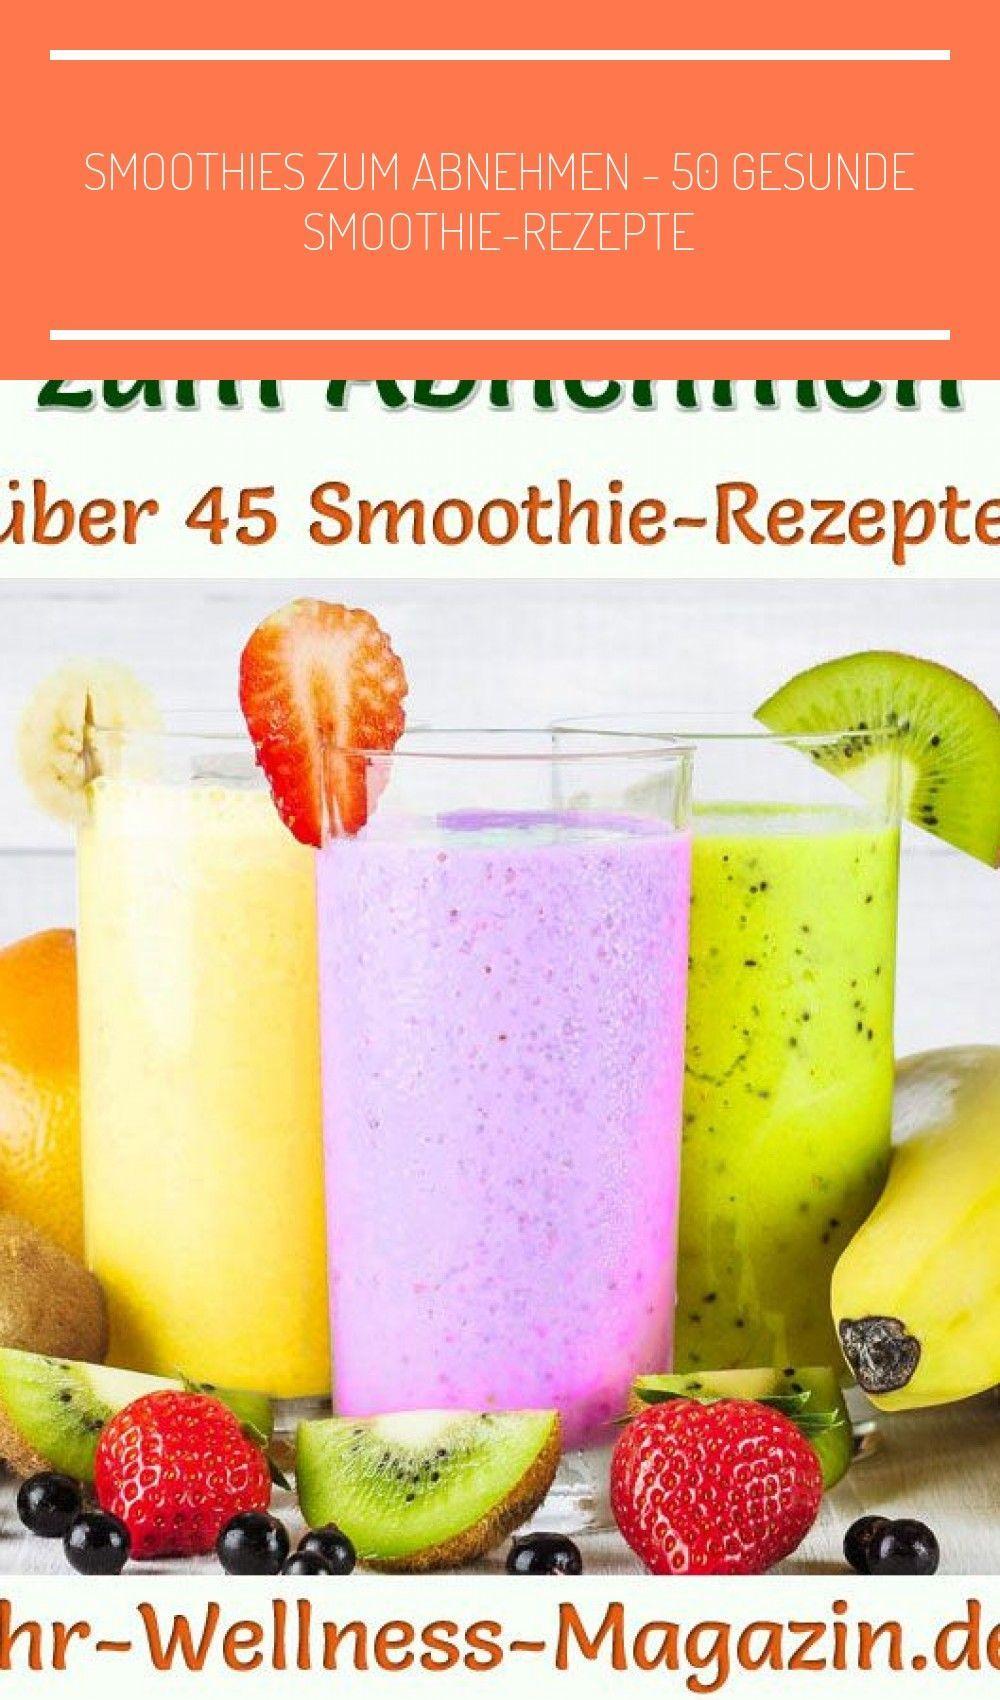 43ba9801c07247f50a21be29a16b29aa - Smoothie Rezepte Obst